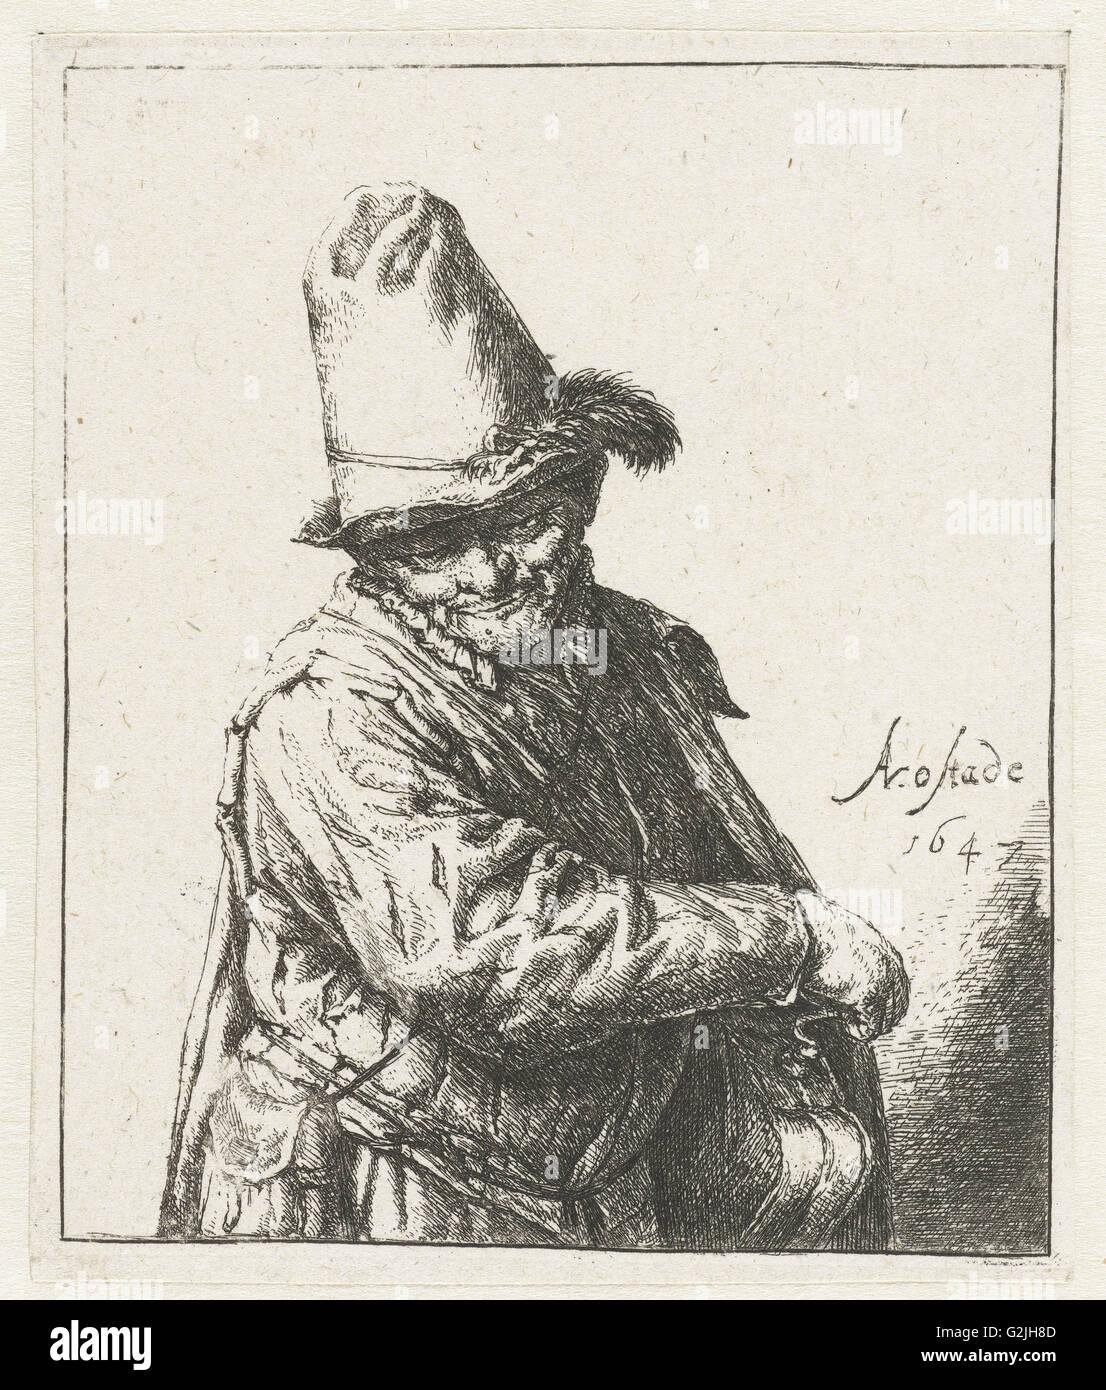 Winch Turner, print maker: Adriaen van Ostade, Adriaen van Ostade, weduwe van Jean Pierre François Basan - Stock Image